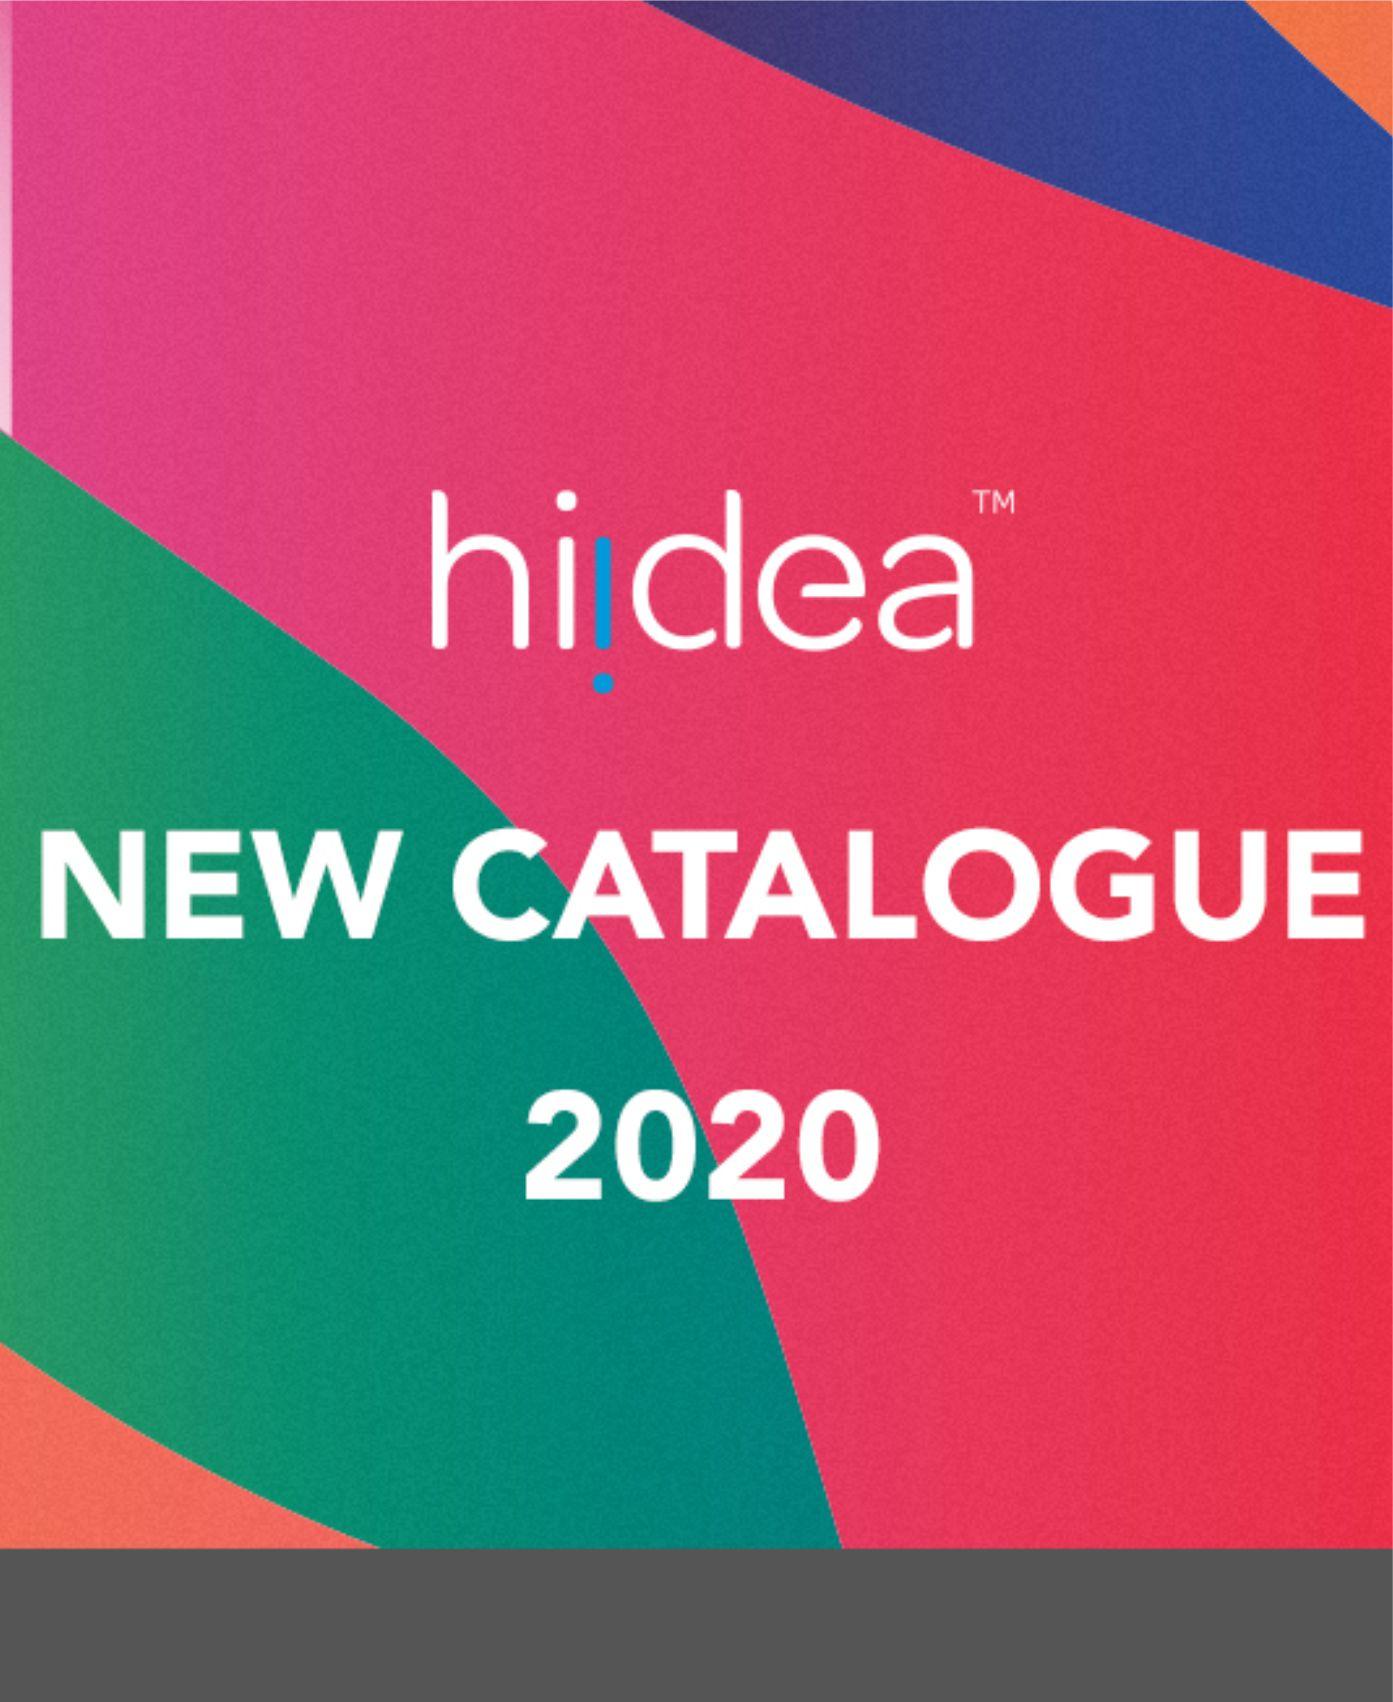 Hiidea katalogas 2020